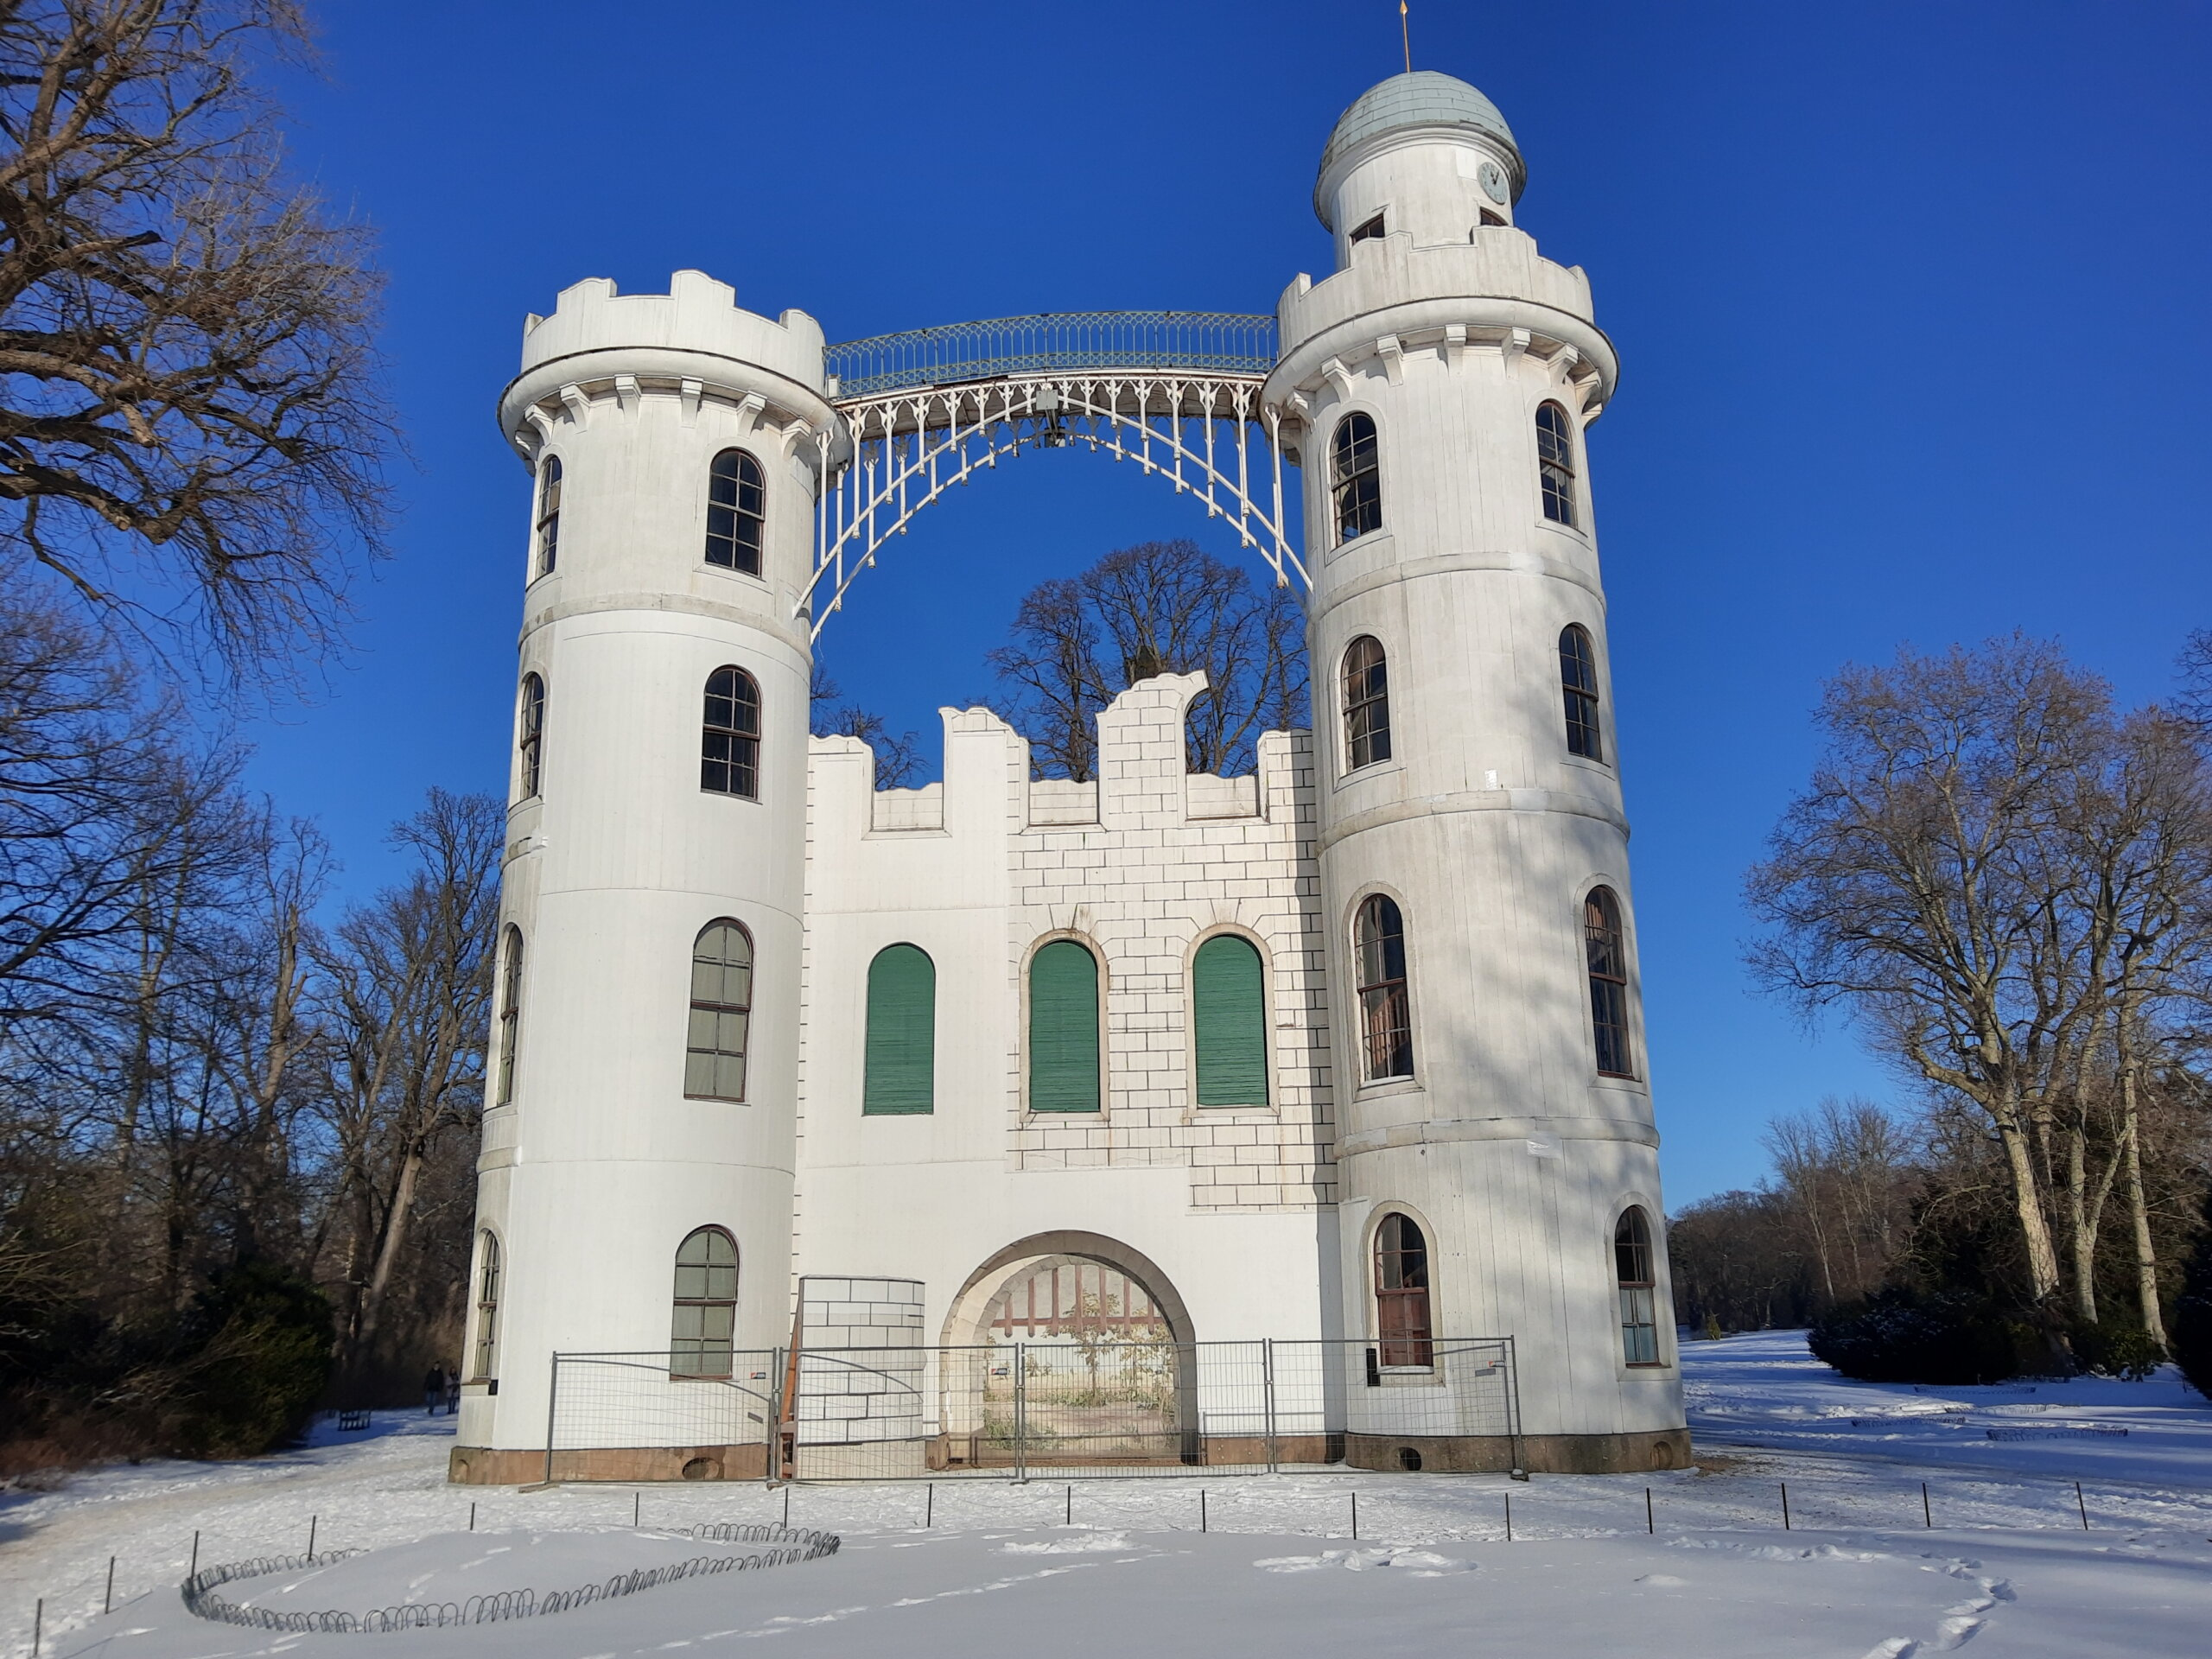 Schloss 18. Jahrhunderts vom Zimmermeister Johann Gottlieb Brendel